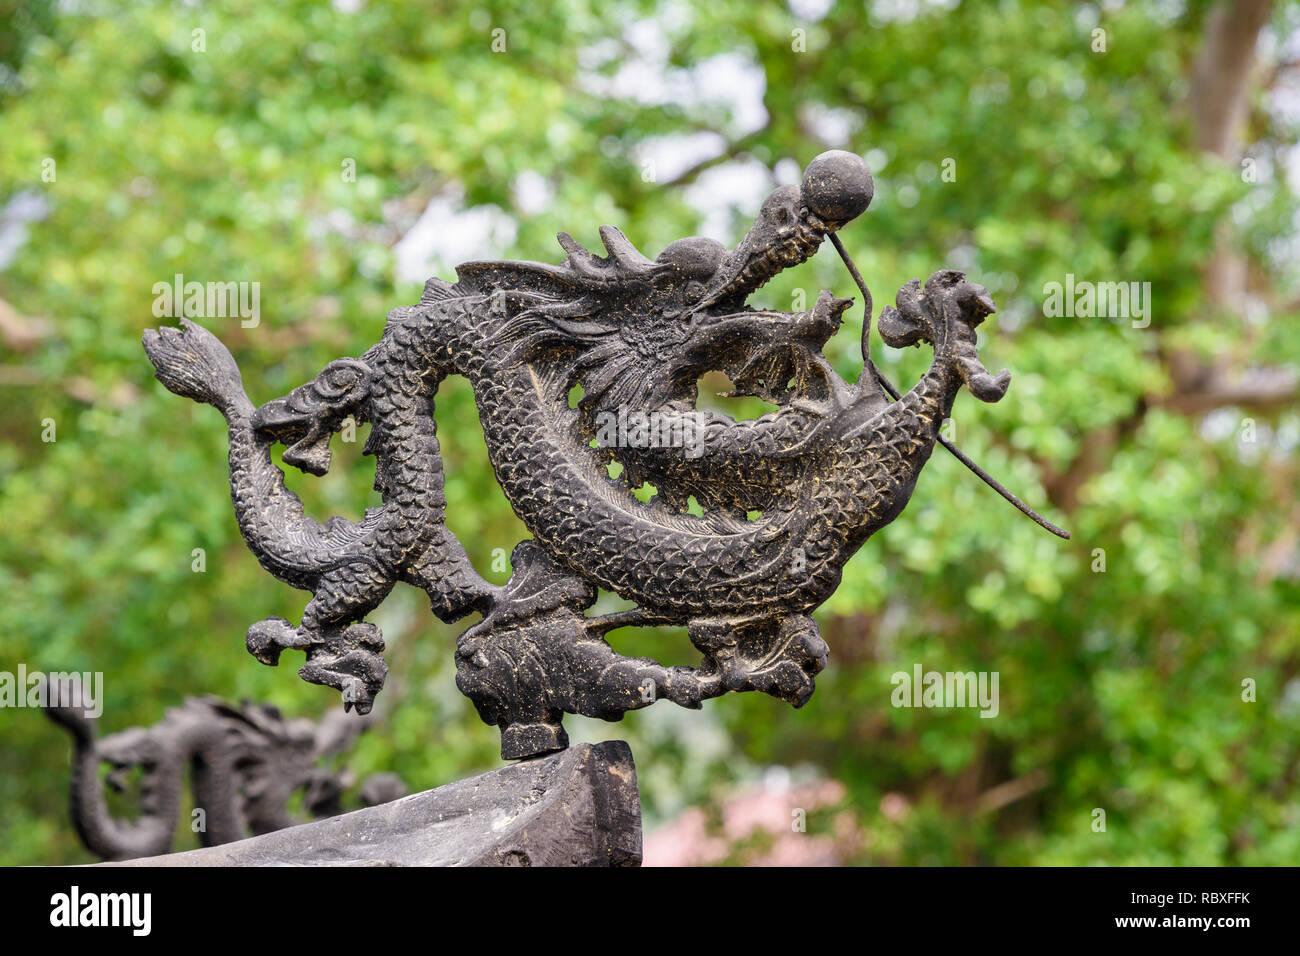 Rooftop detail of a dragon on a incense urn at the Po Lin Monastery, Lantau Island, Hong Kong - Stock Image